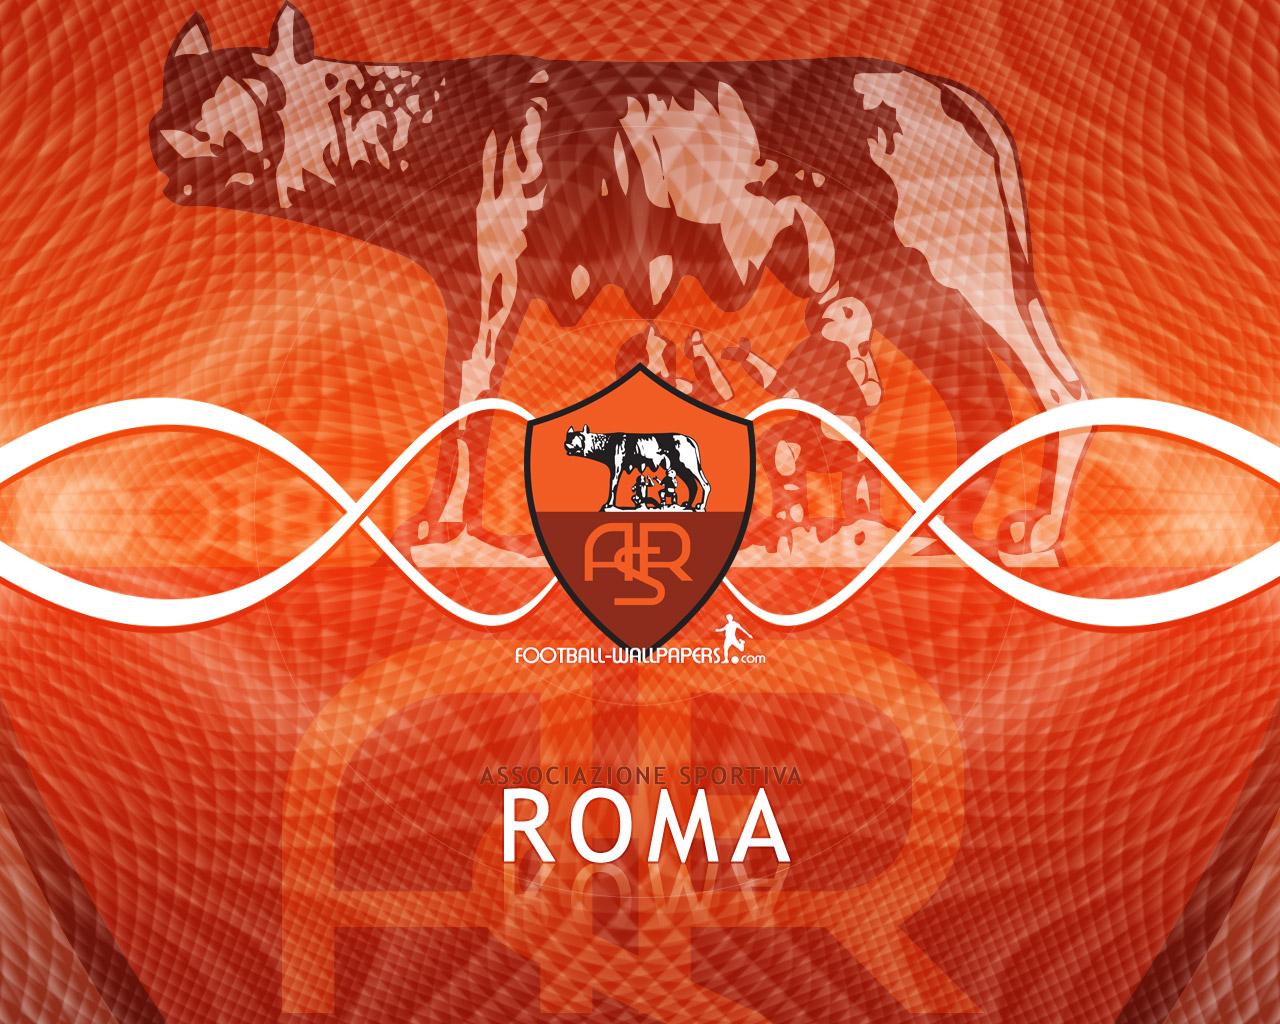 roma as threadgo general desktop 1280x1024 wallpaper 24292 1280x1024